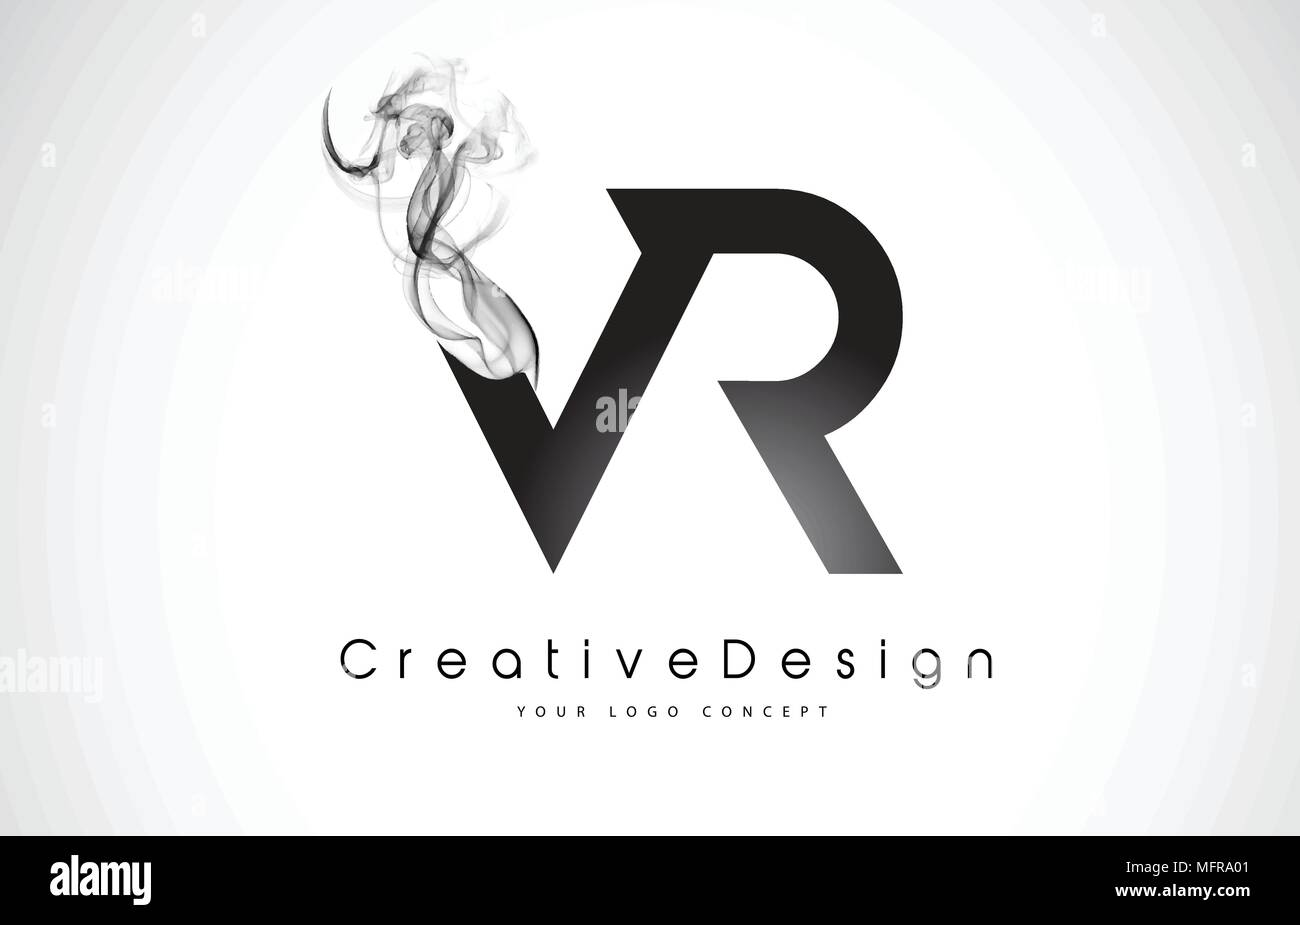 Vr Letter Logo Design With Black Smoke Creative Modern